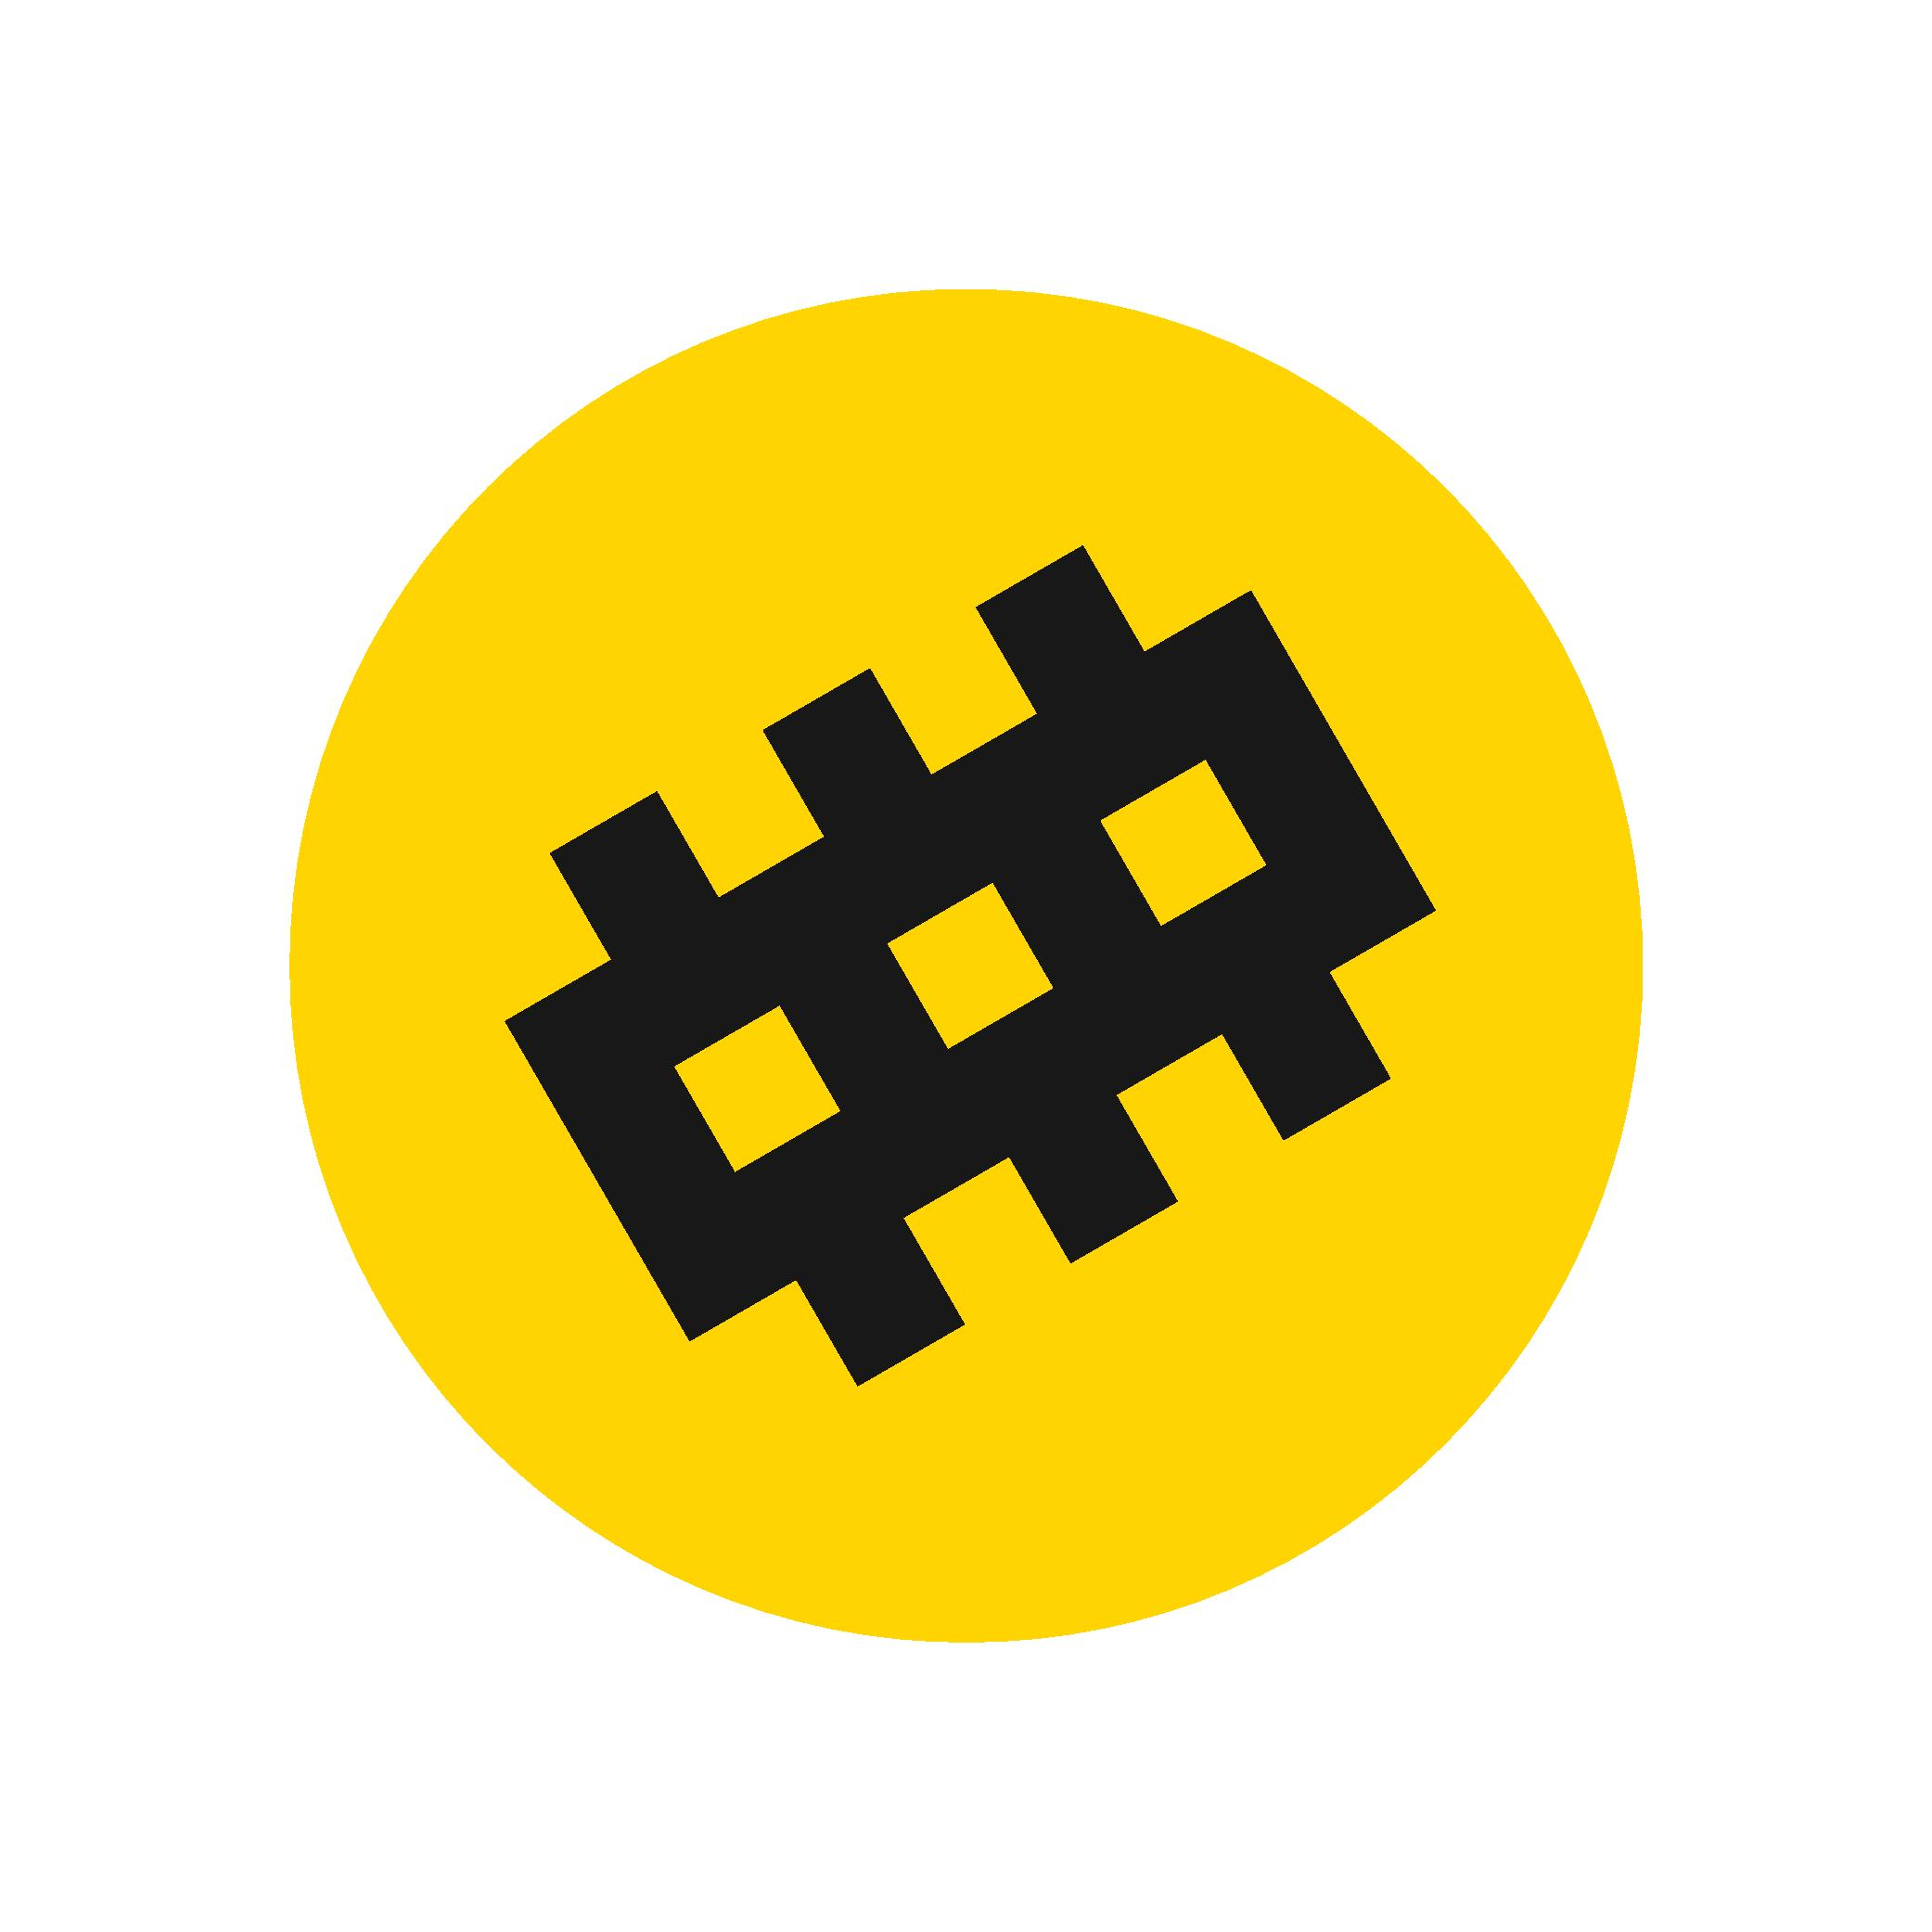 3fs_logo-page-001